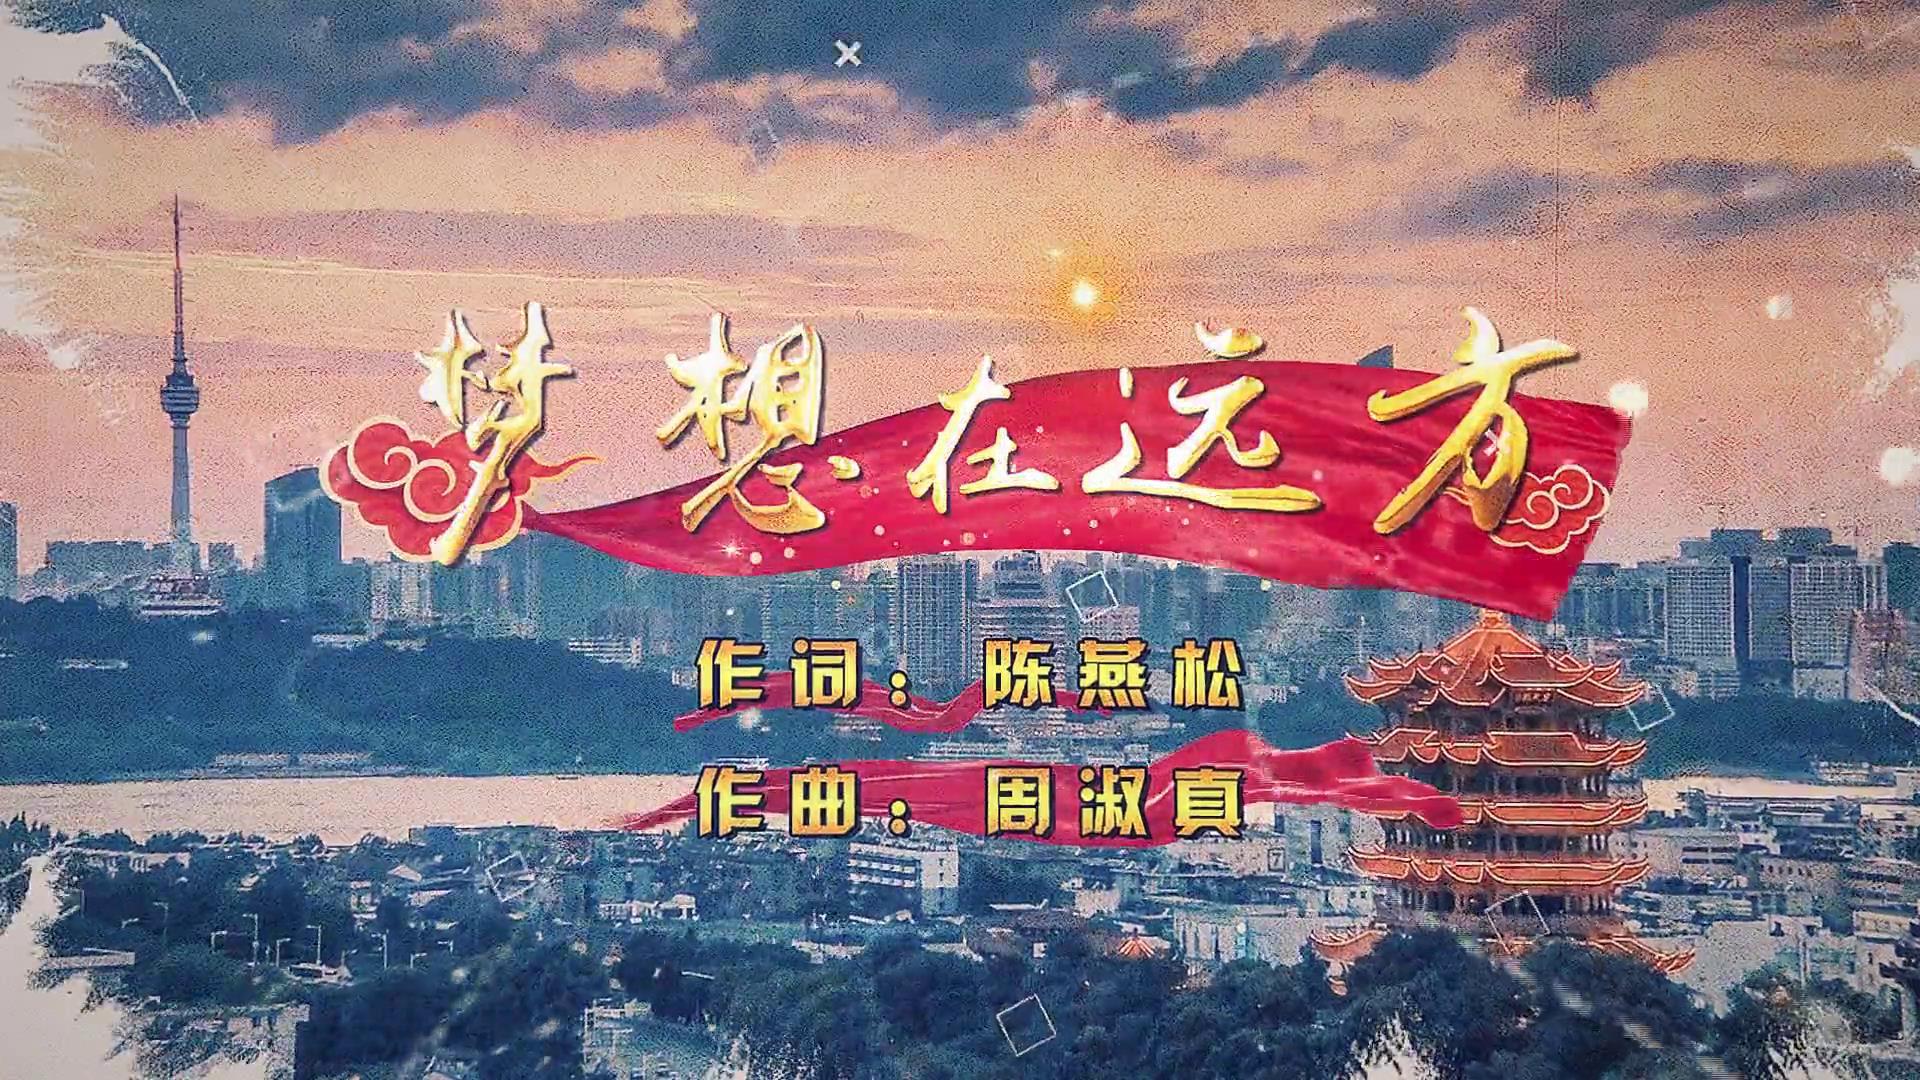 《夢(meng)想(xiang)在遠方》[封(feng)面圖].jpg